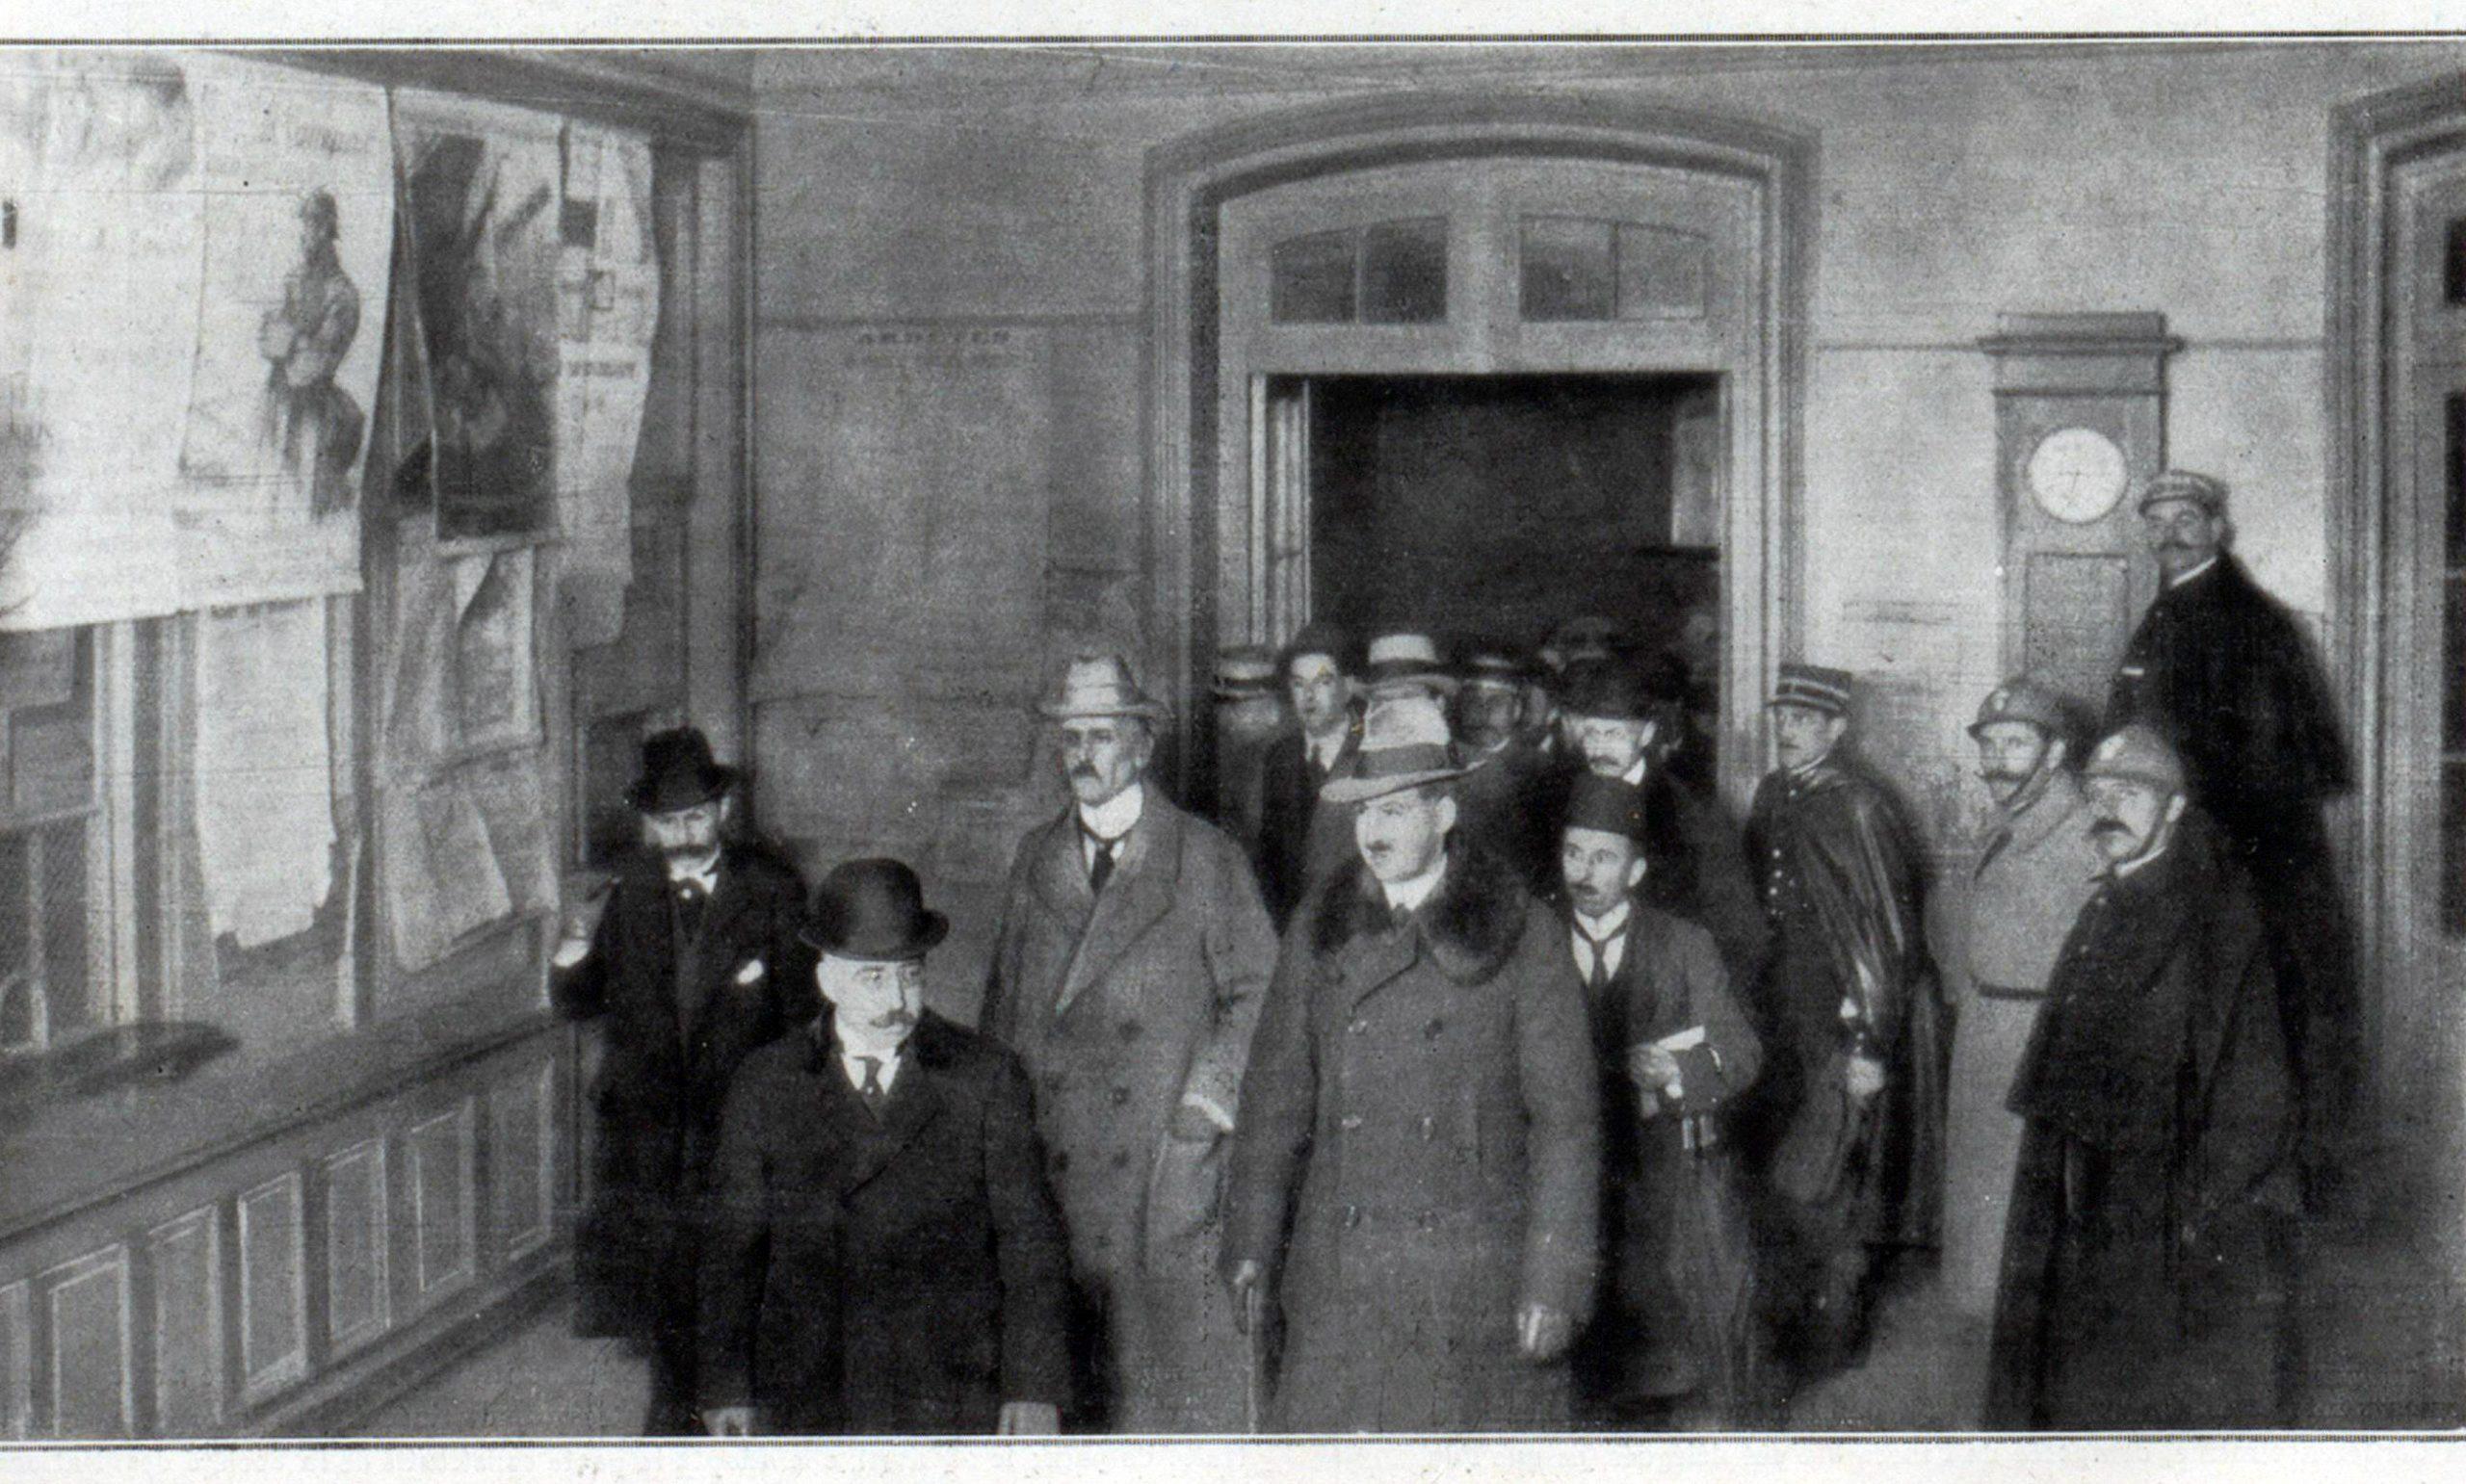 Sosirea delegației germane la Versailles, aprilie 1919